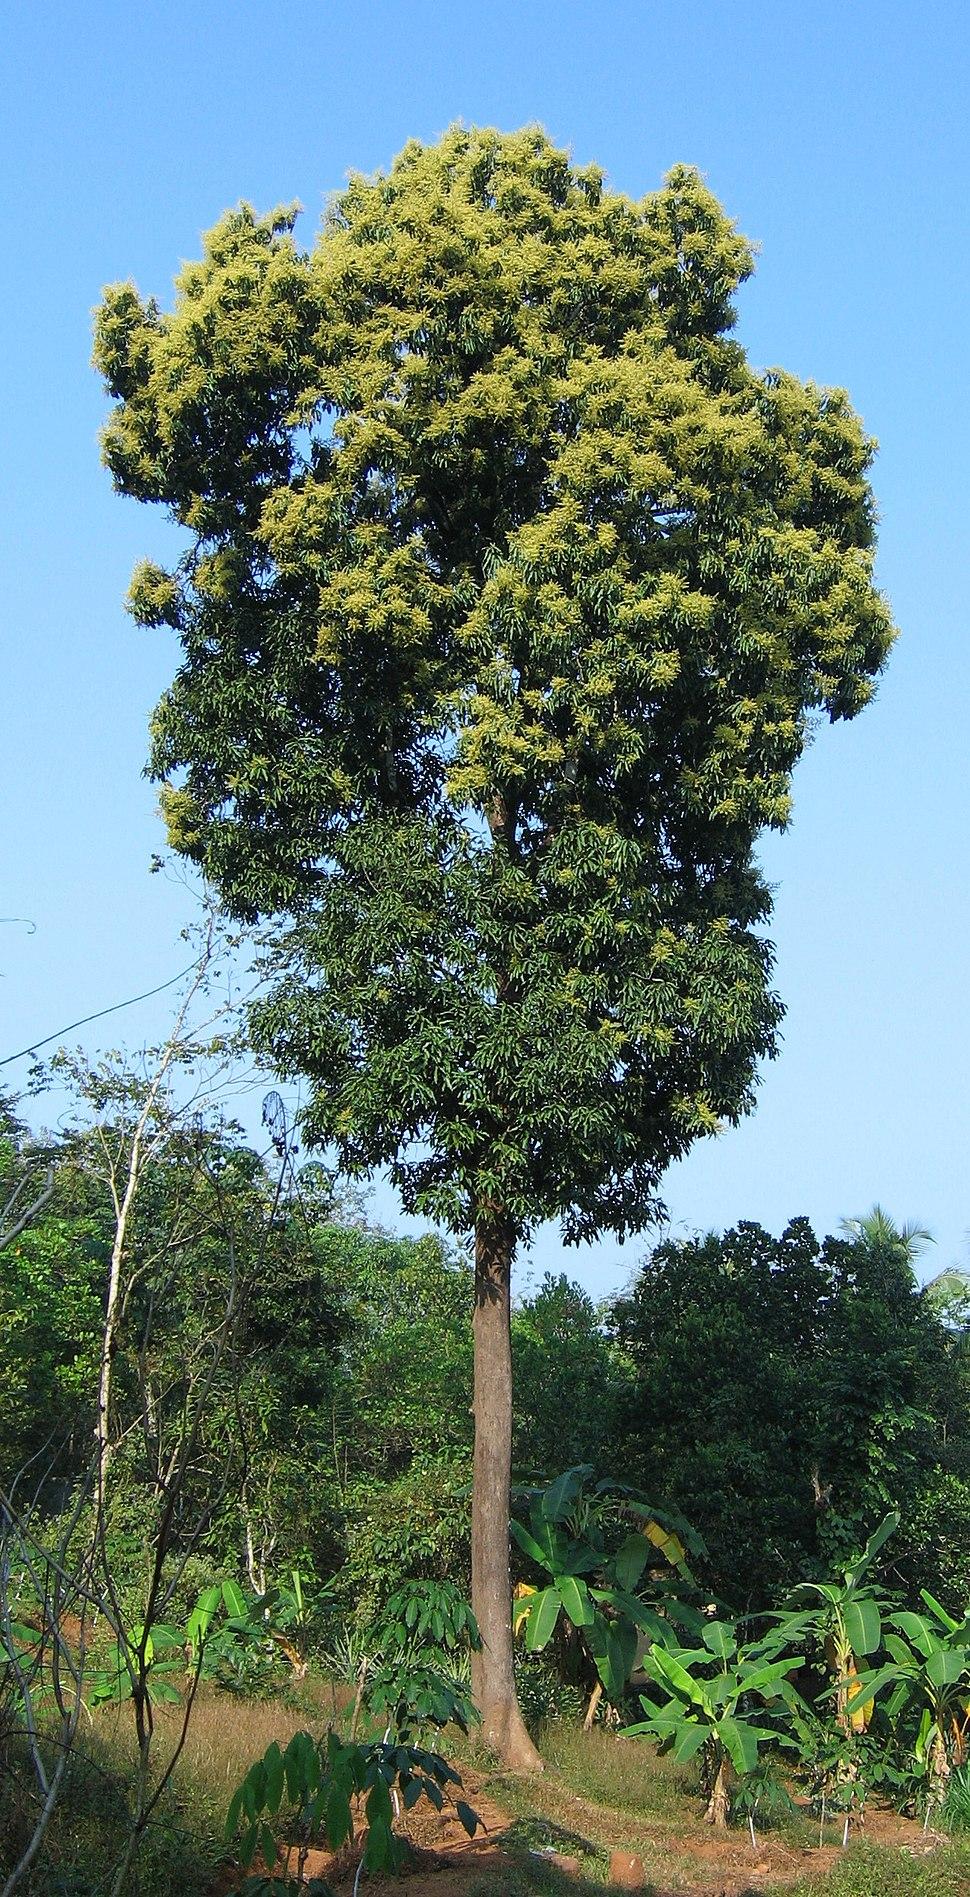 Mango tree Kerala in full bloom